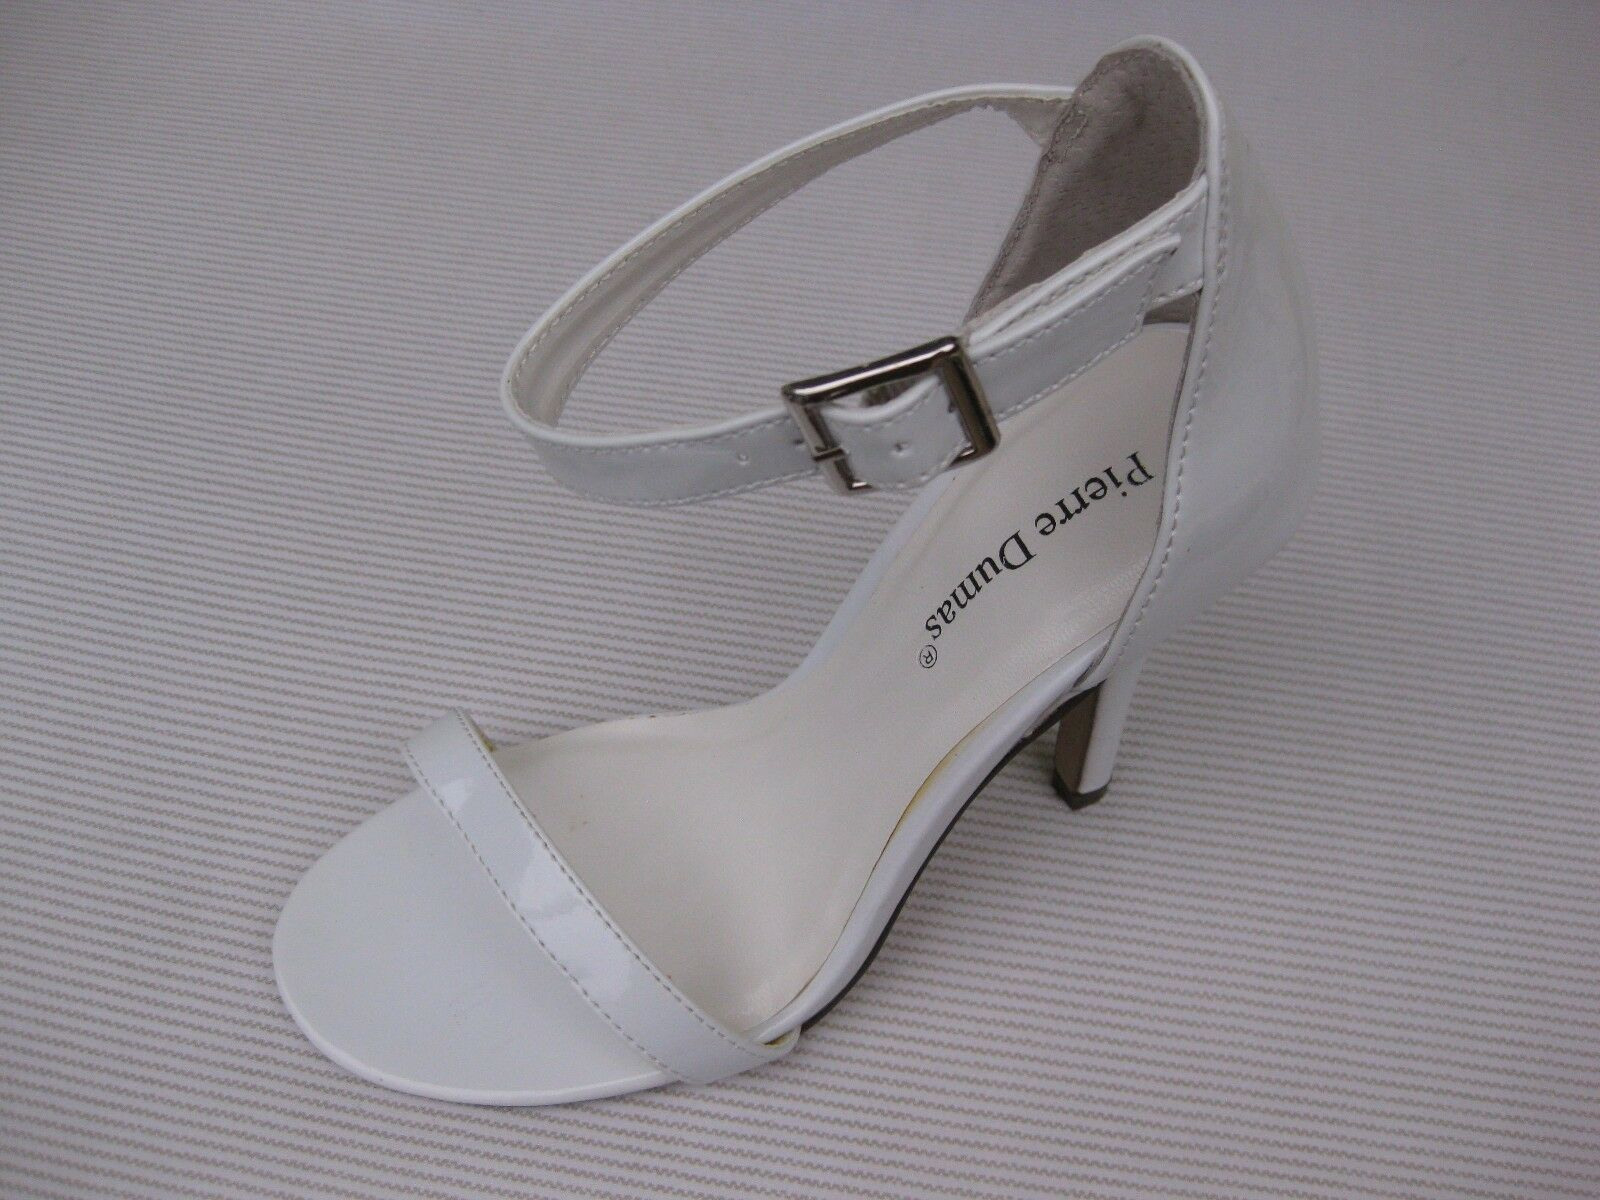 Pierre Ankle Dumas Womens Shoes NEW $45 Margaret White Patent Ankle Pierre Strap Sandal 6.5 M 023dda